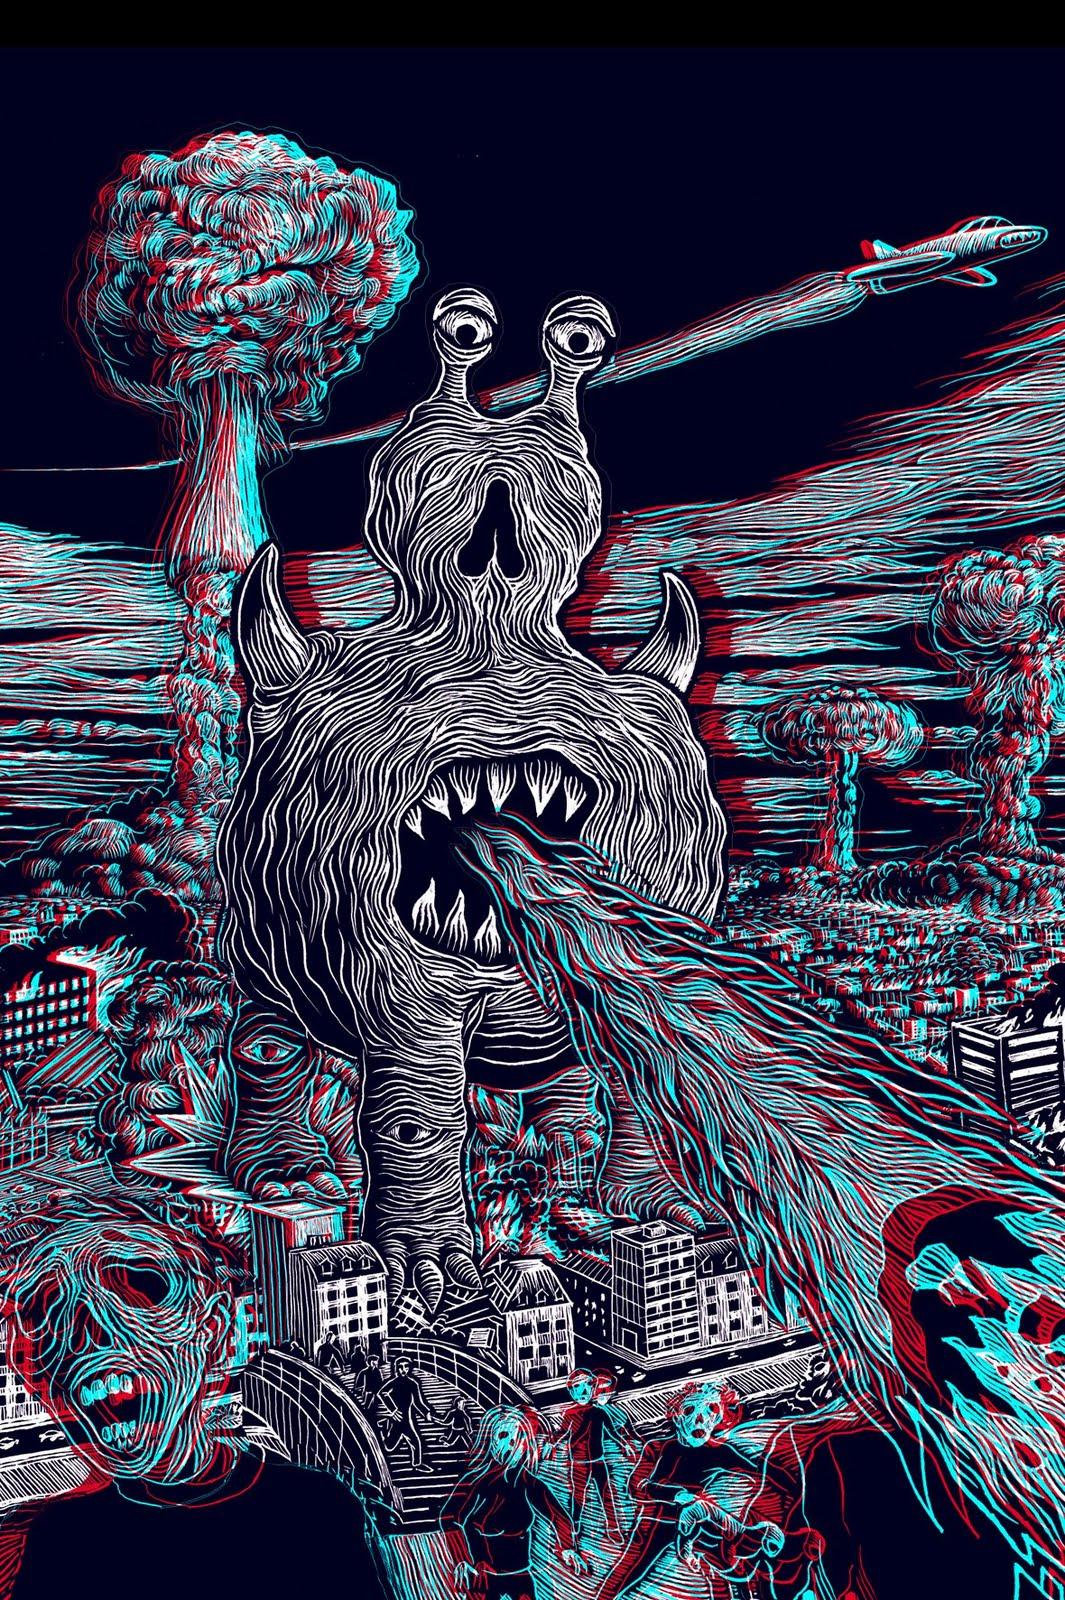 Tomahawk - Apocalypse (3D)